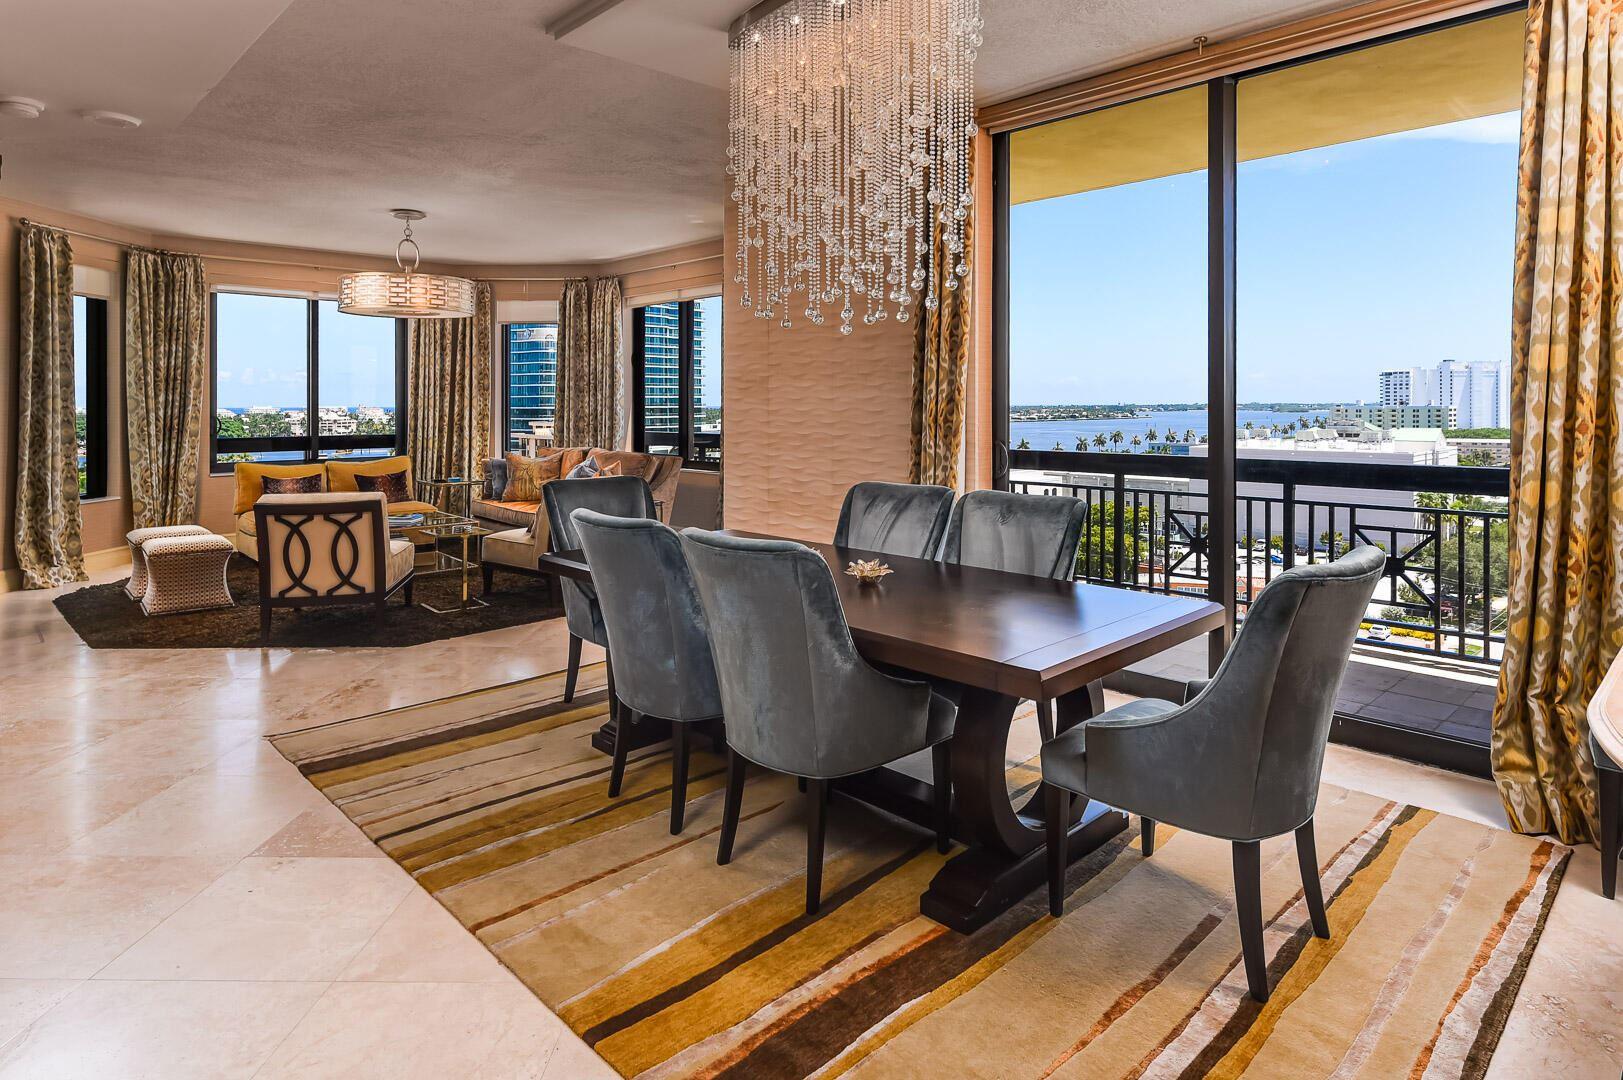 801 S Olive Avenue #706, West Palm Beach, FL 33401 - MLS#: RX-10719336